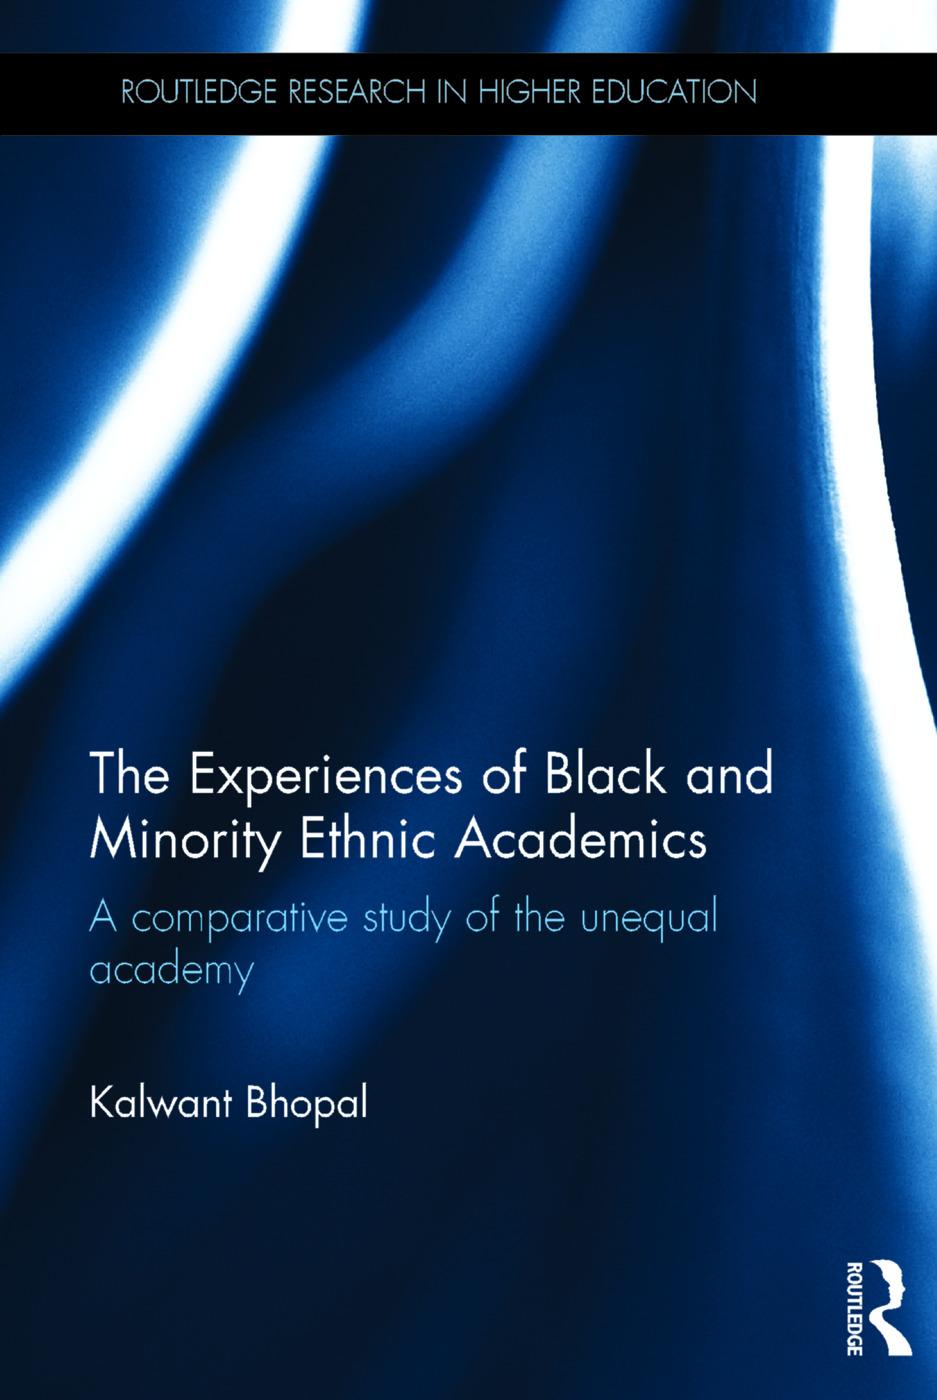 The Experiences of Black and Minority Ethnic Academics